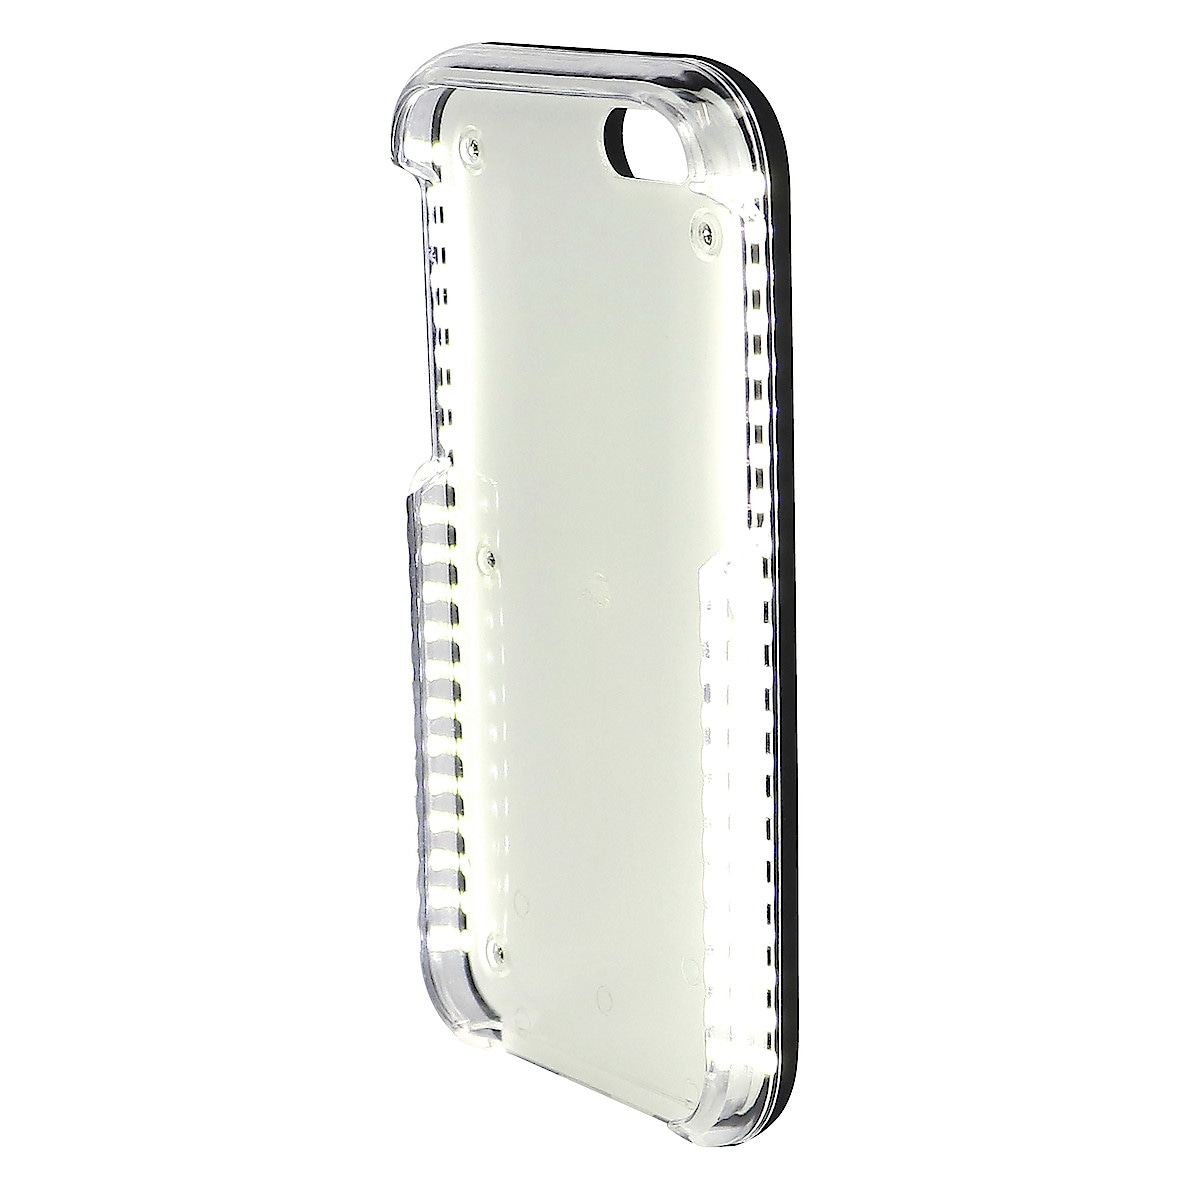 CASU Illuminated LED Selfie Case for iPhone 7